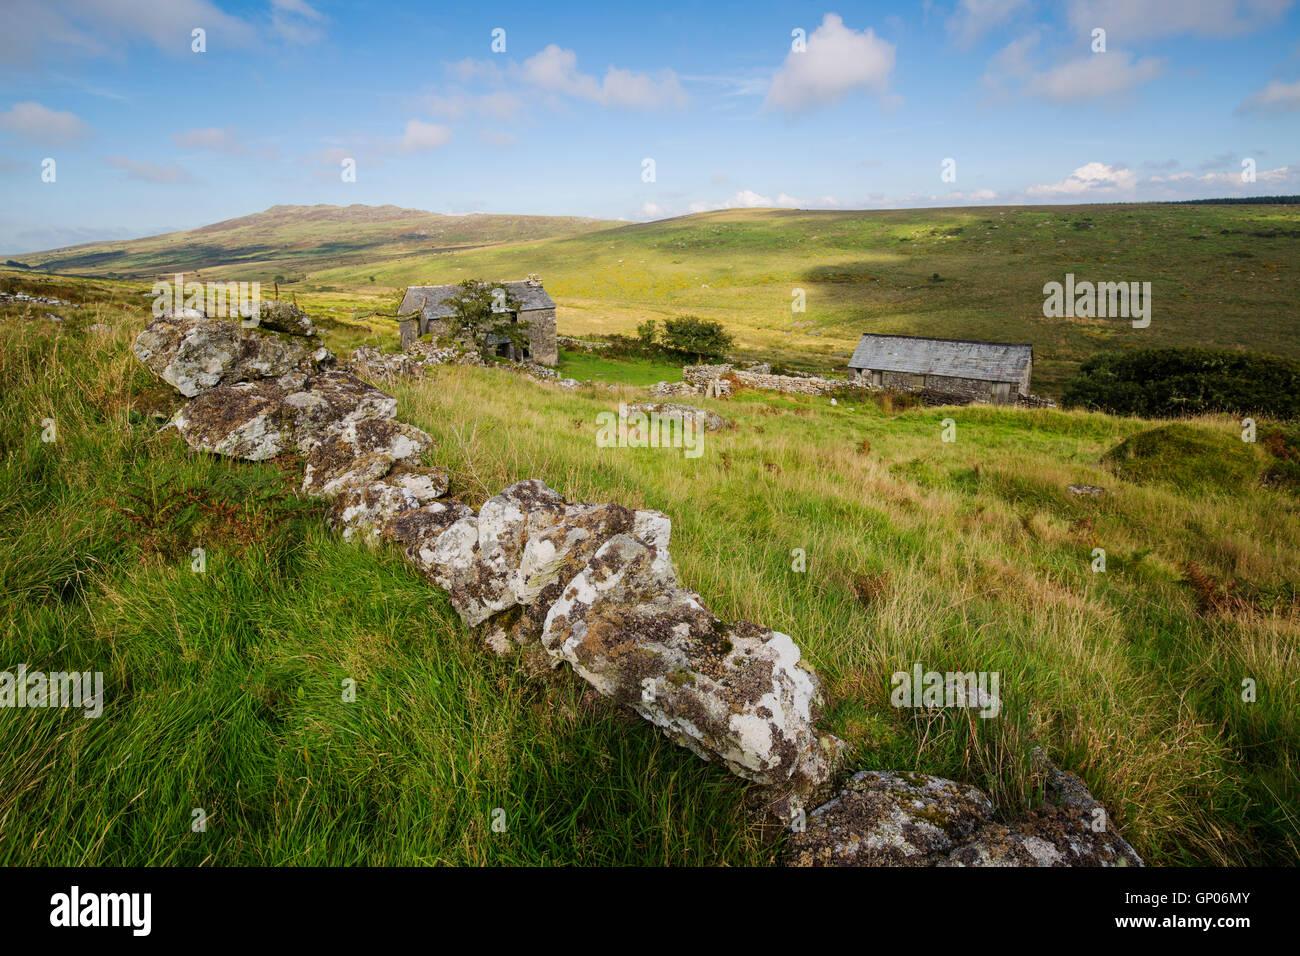 Deserted Garrow Farm high on Bodmin Moor - Stock Image